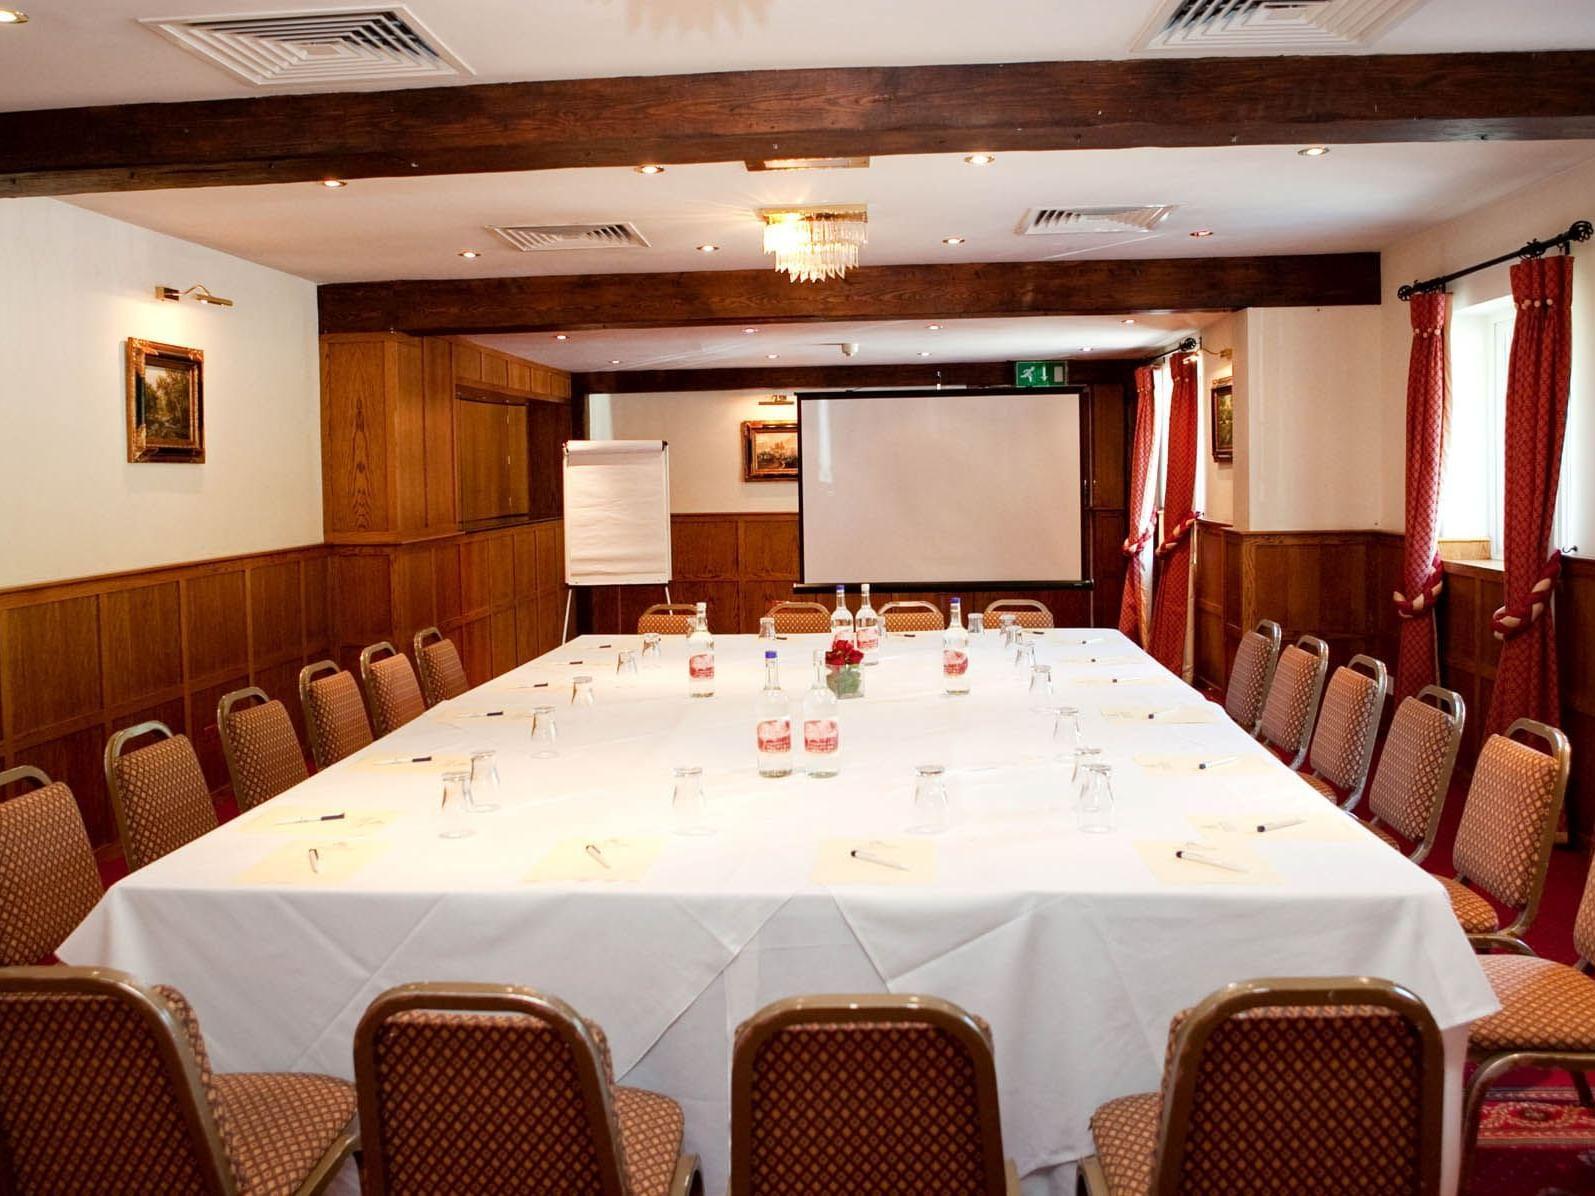 Windsor meeting room at Barn Hotel Ruislip near London